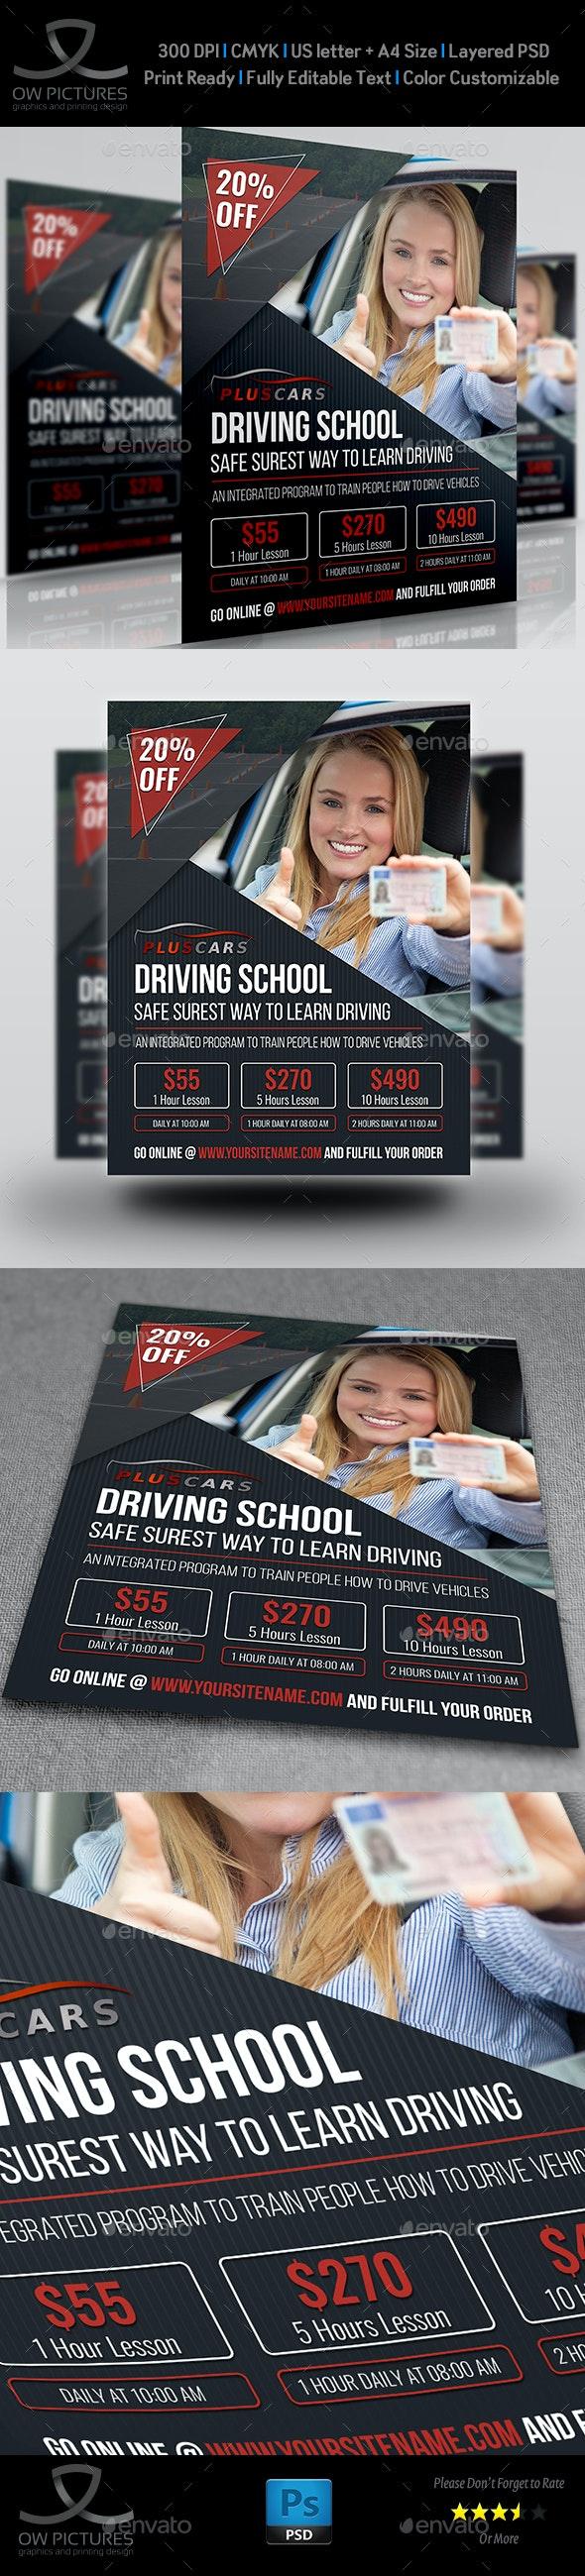 Driving School Flyer Template Vol.2 - Commerce Flyers